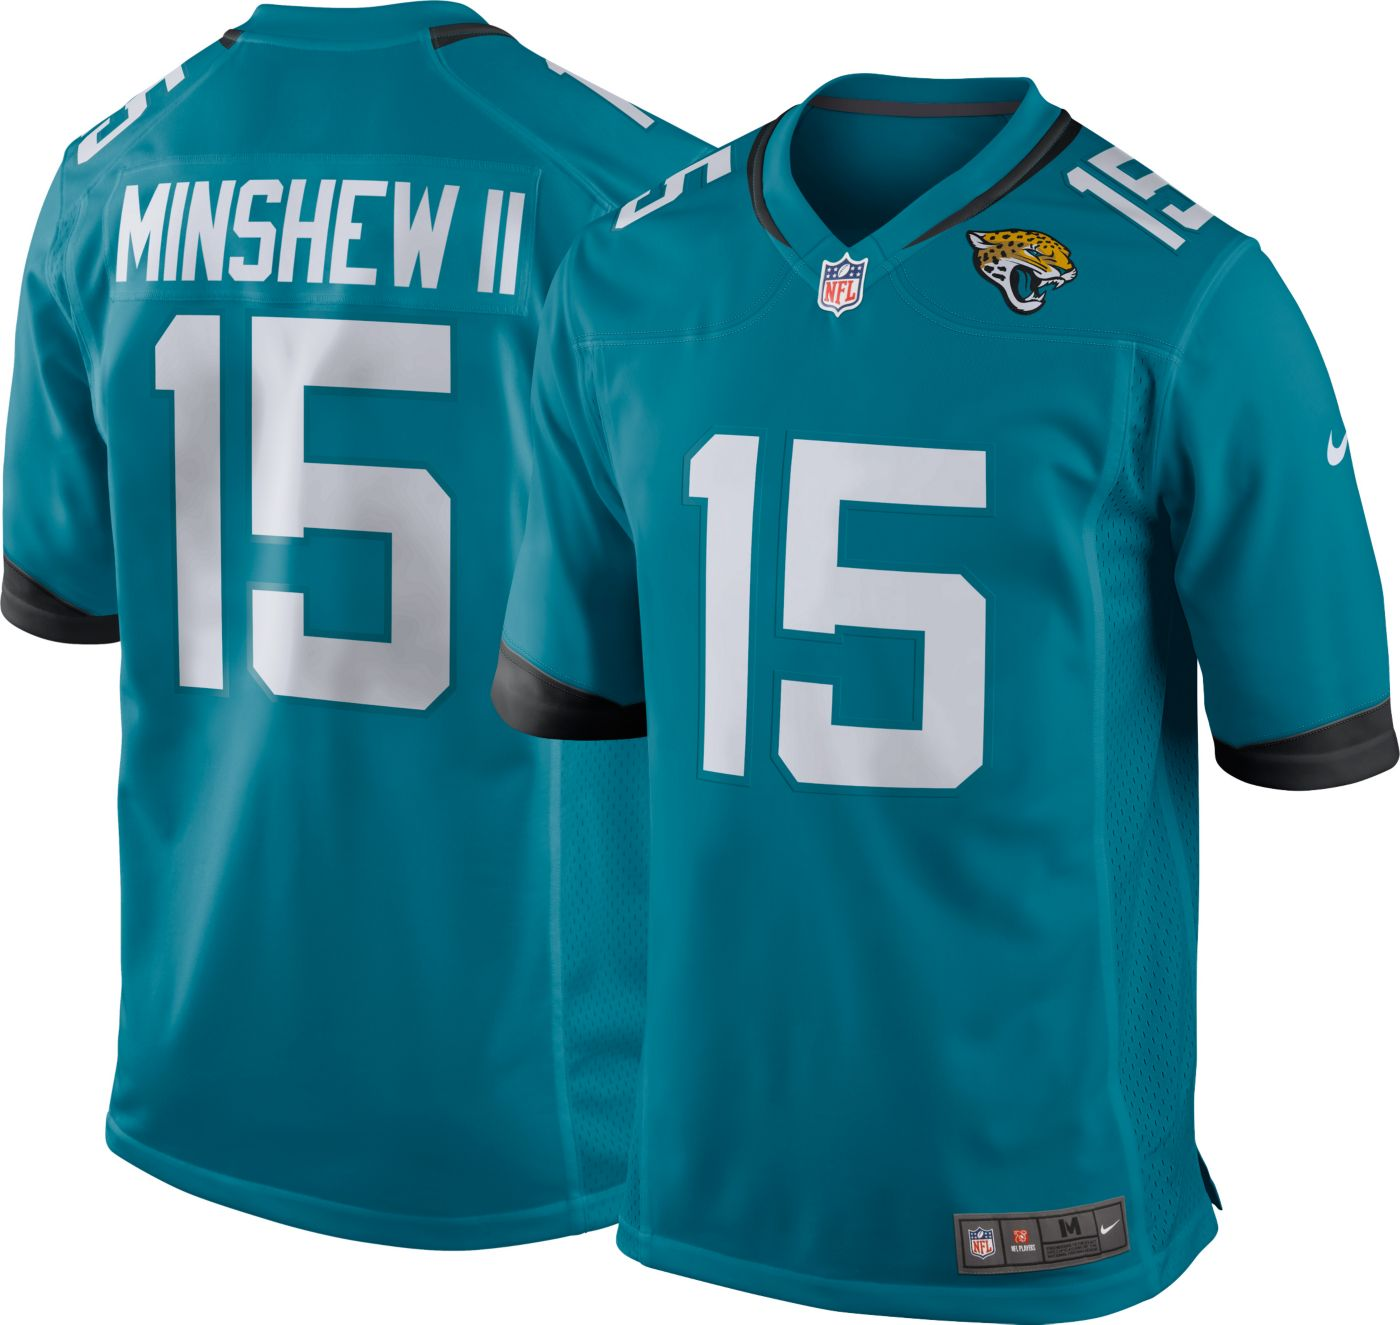 Nike Men's Alternate Game Jersey Jacksonville Jaguars Gardner Minshew II #15